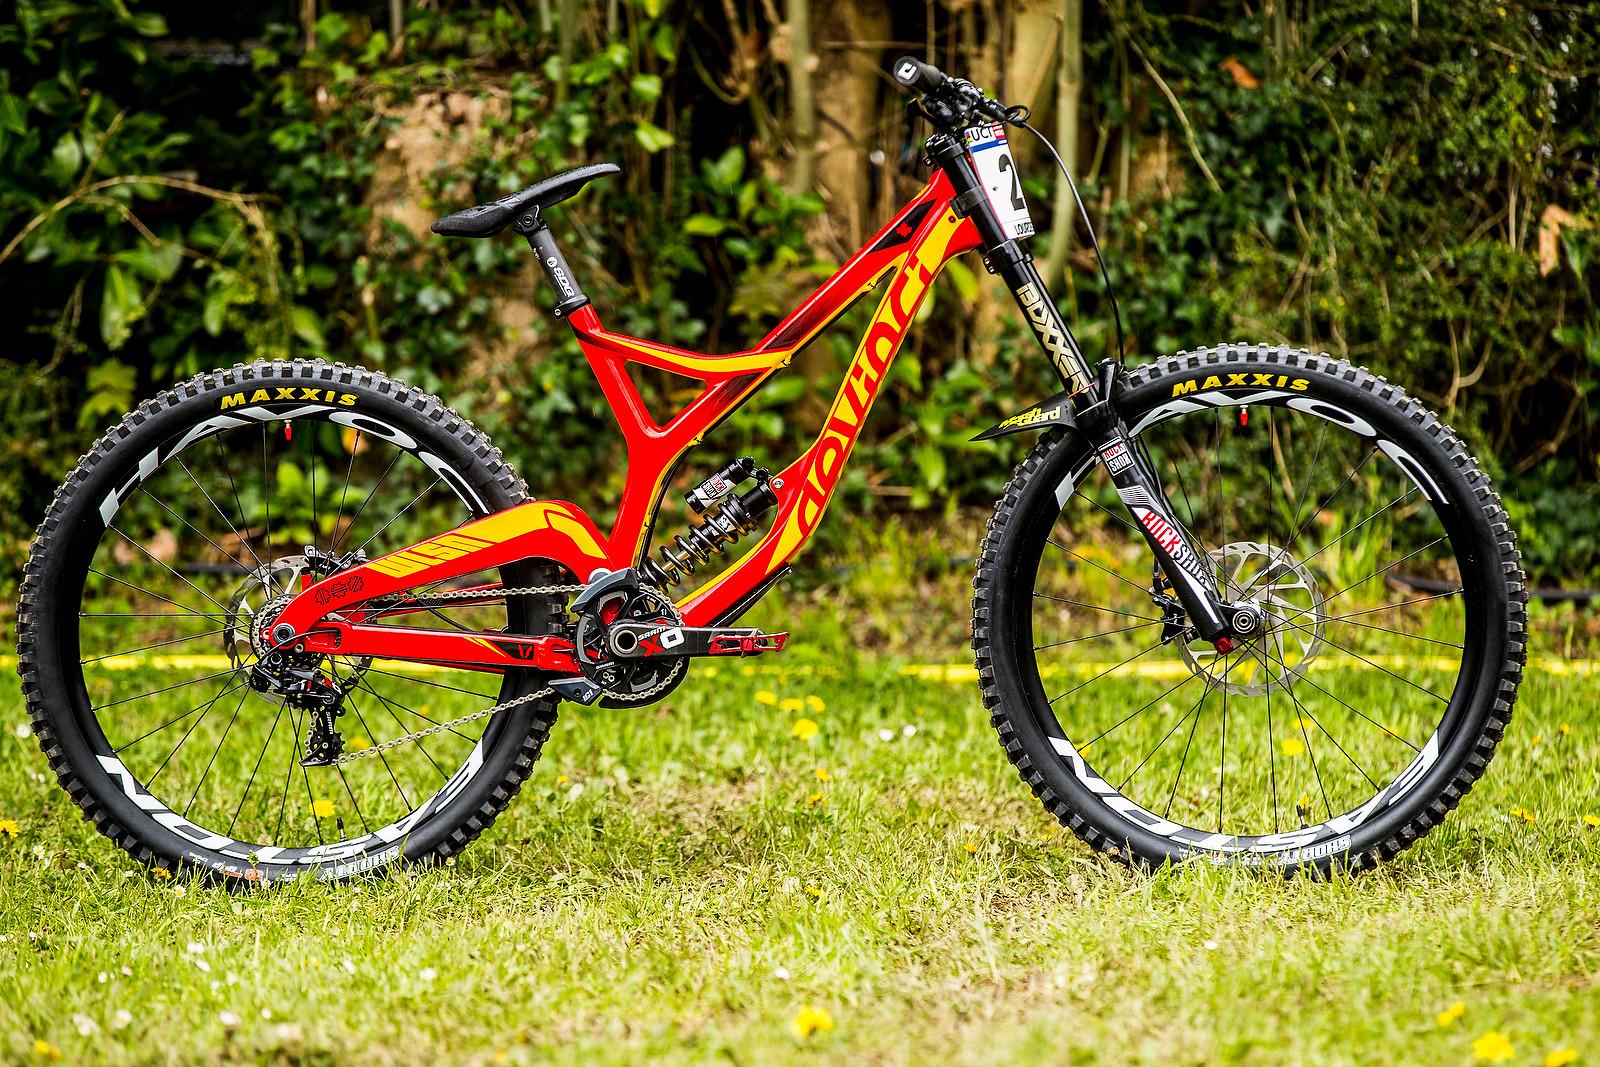 Stevie Smith's Devinci Wilson Carbon - PIT BITS - 2016 Lourdes World Cup Downhill - Mountain Biking Pictures - Vital MTB